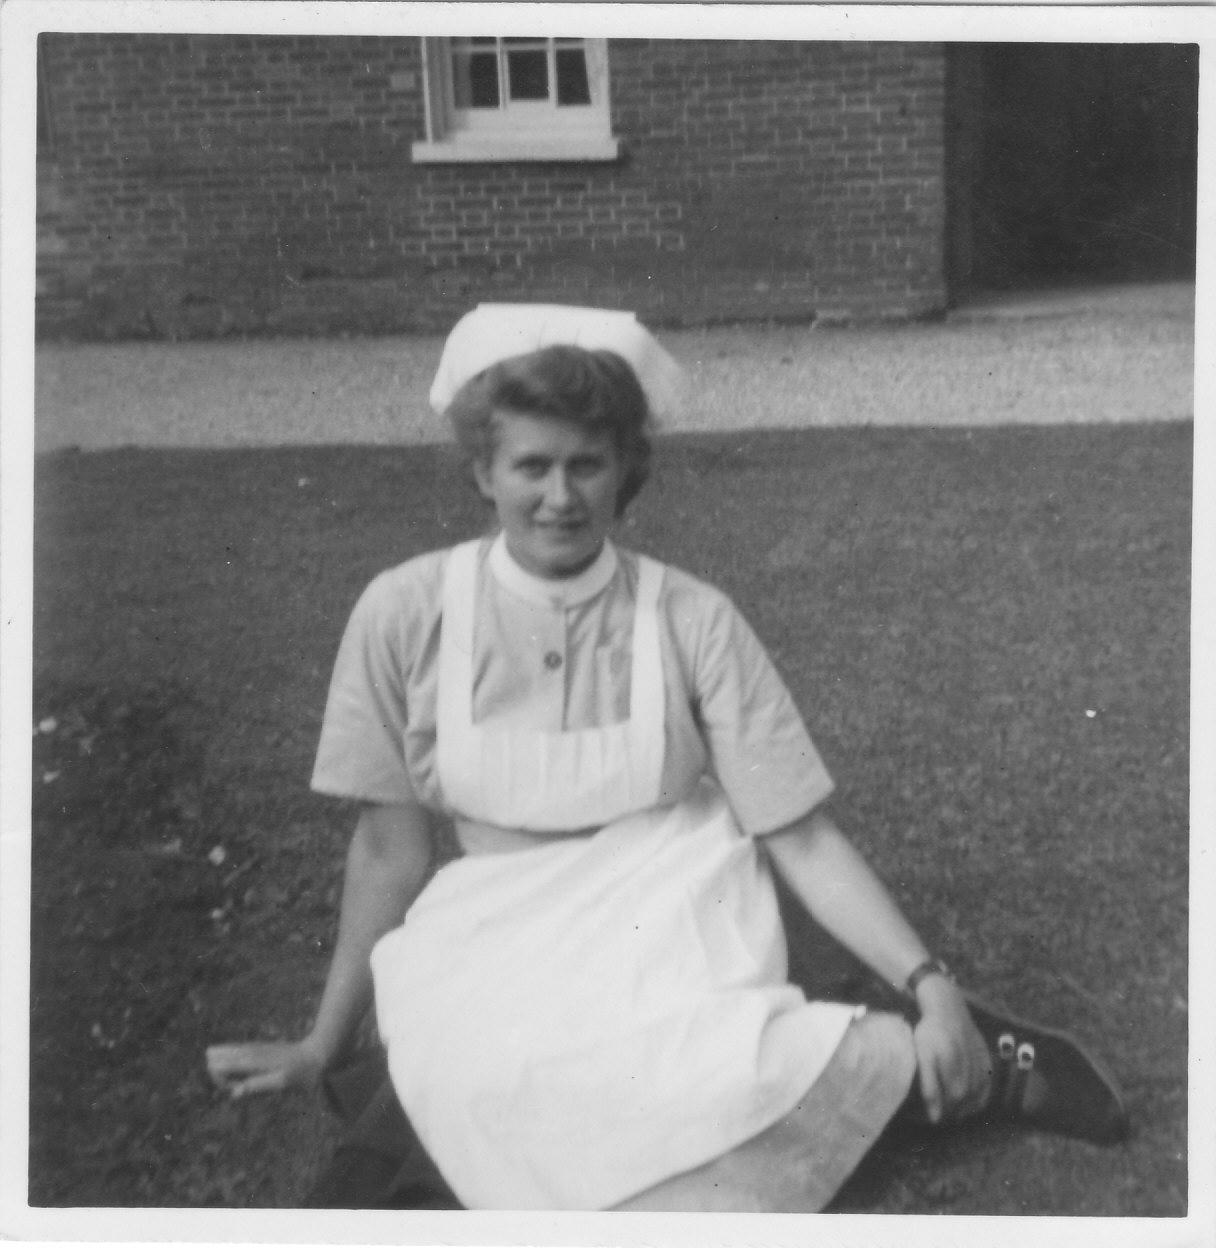 Gressenhall photos - Gladys Richmond.jpg (1216px x 1248px)